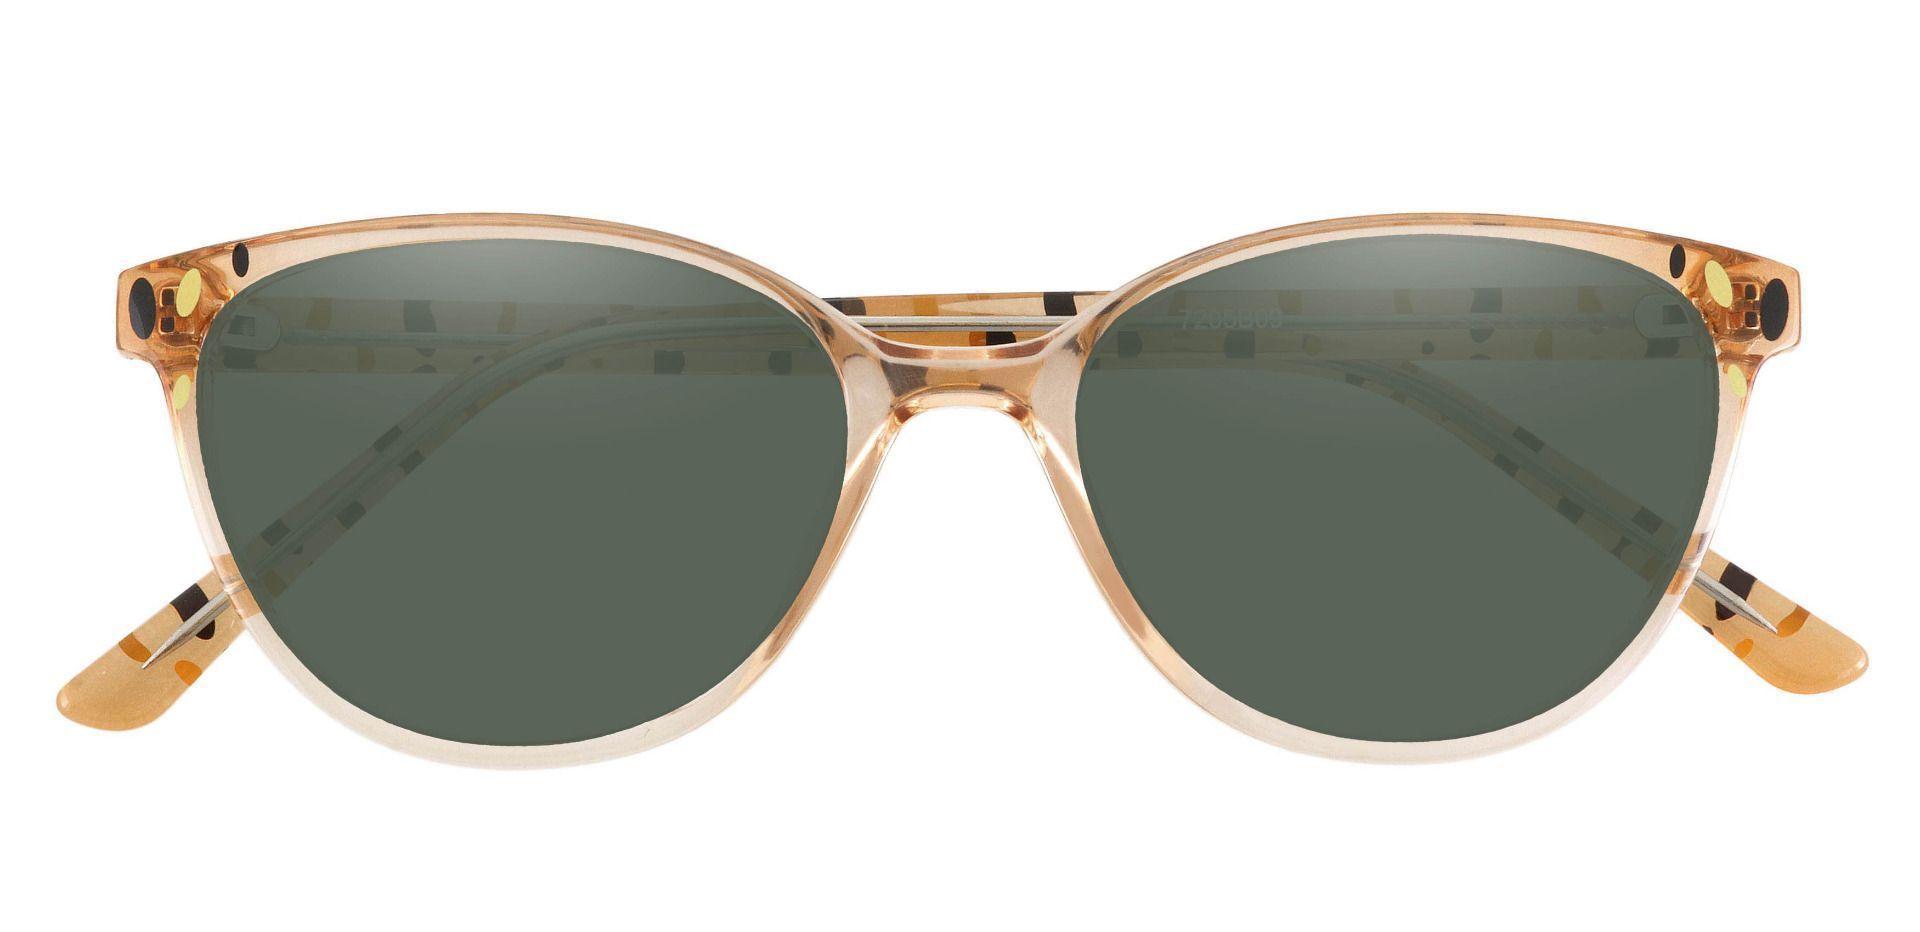 Carma Oval Prescription Sunglasses - Brown Frame With Green Lenses